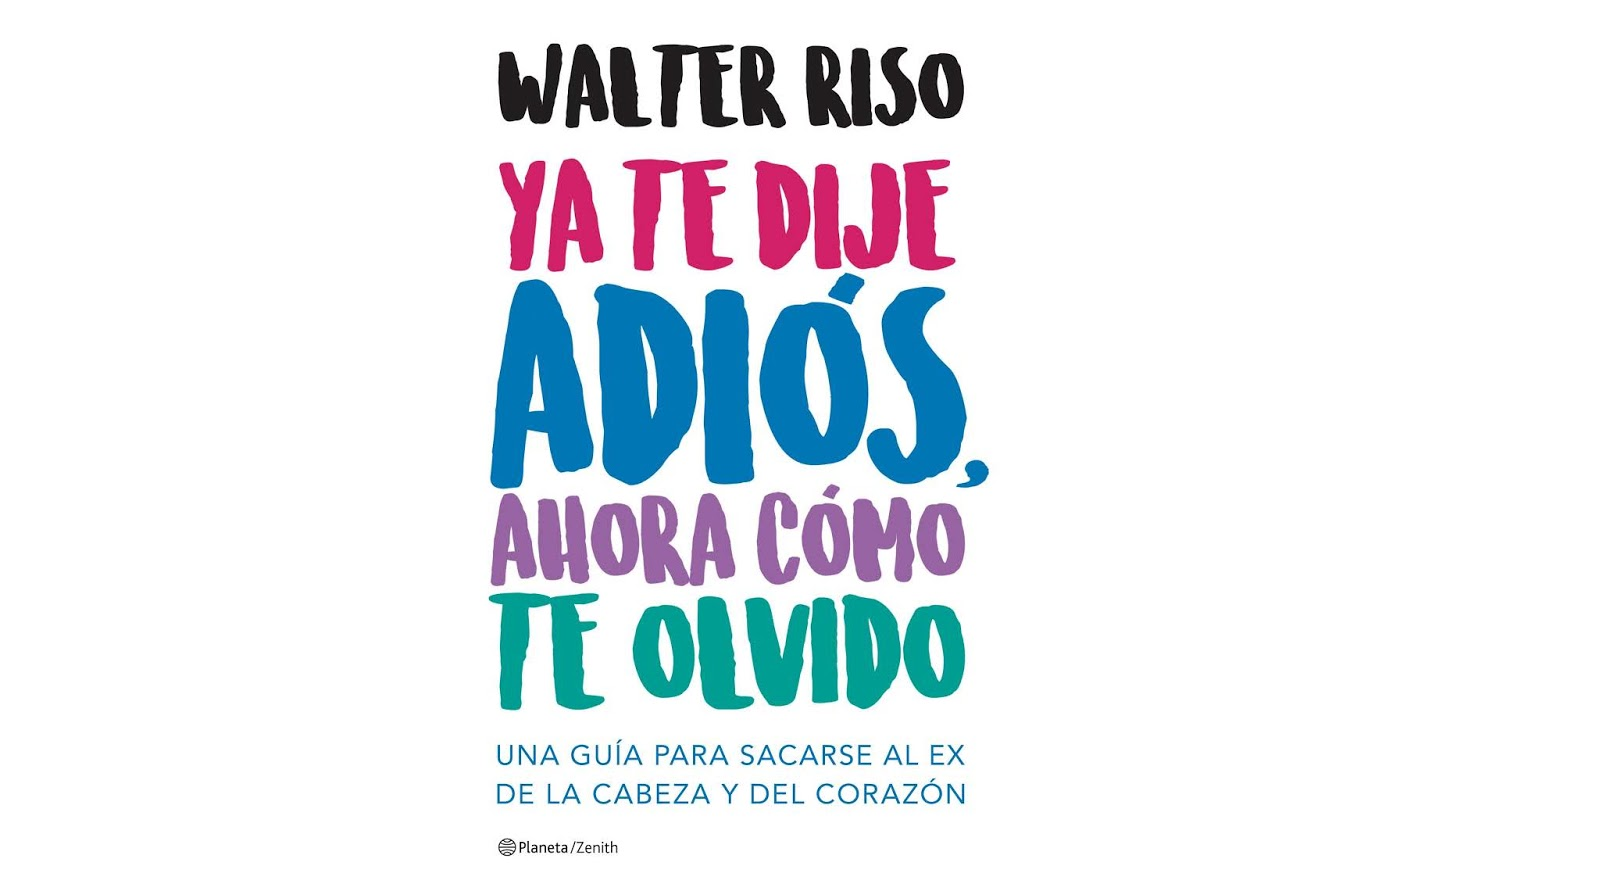 Ya te dije adiós, ahora como te olvido. Walter Riso. PDF